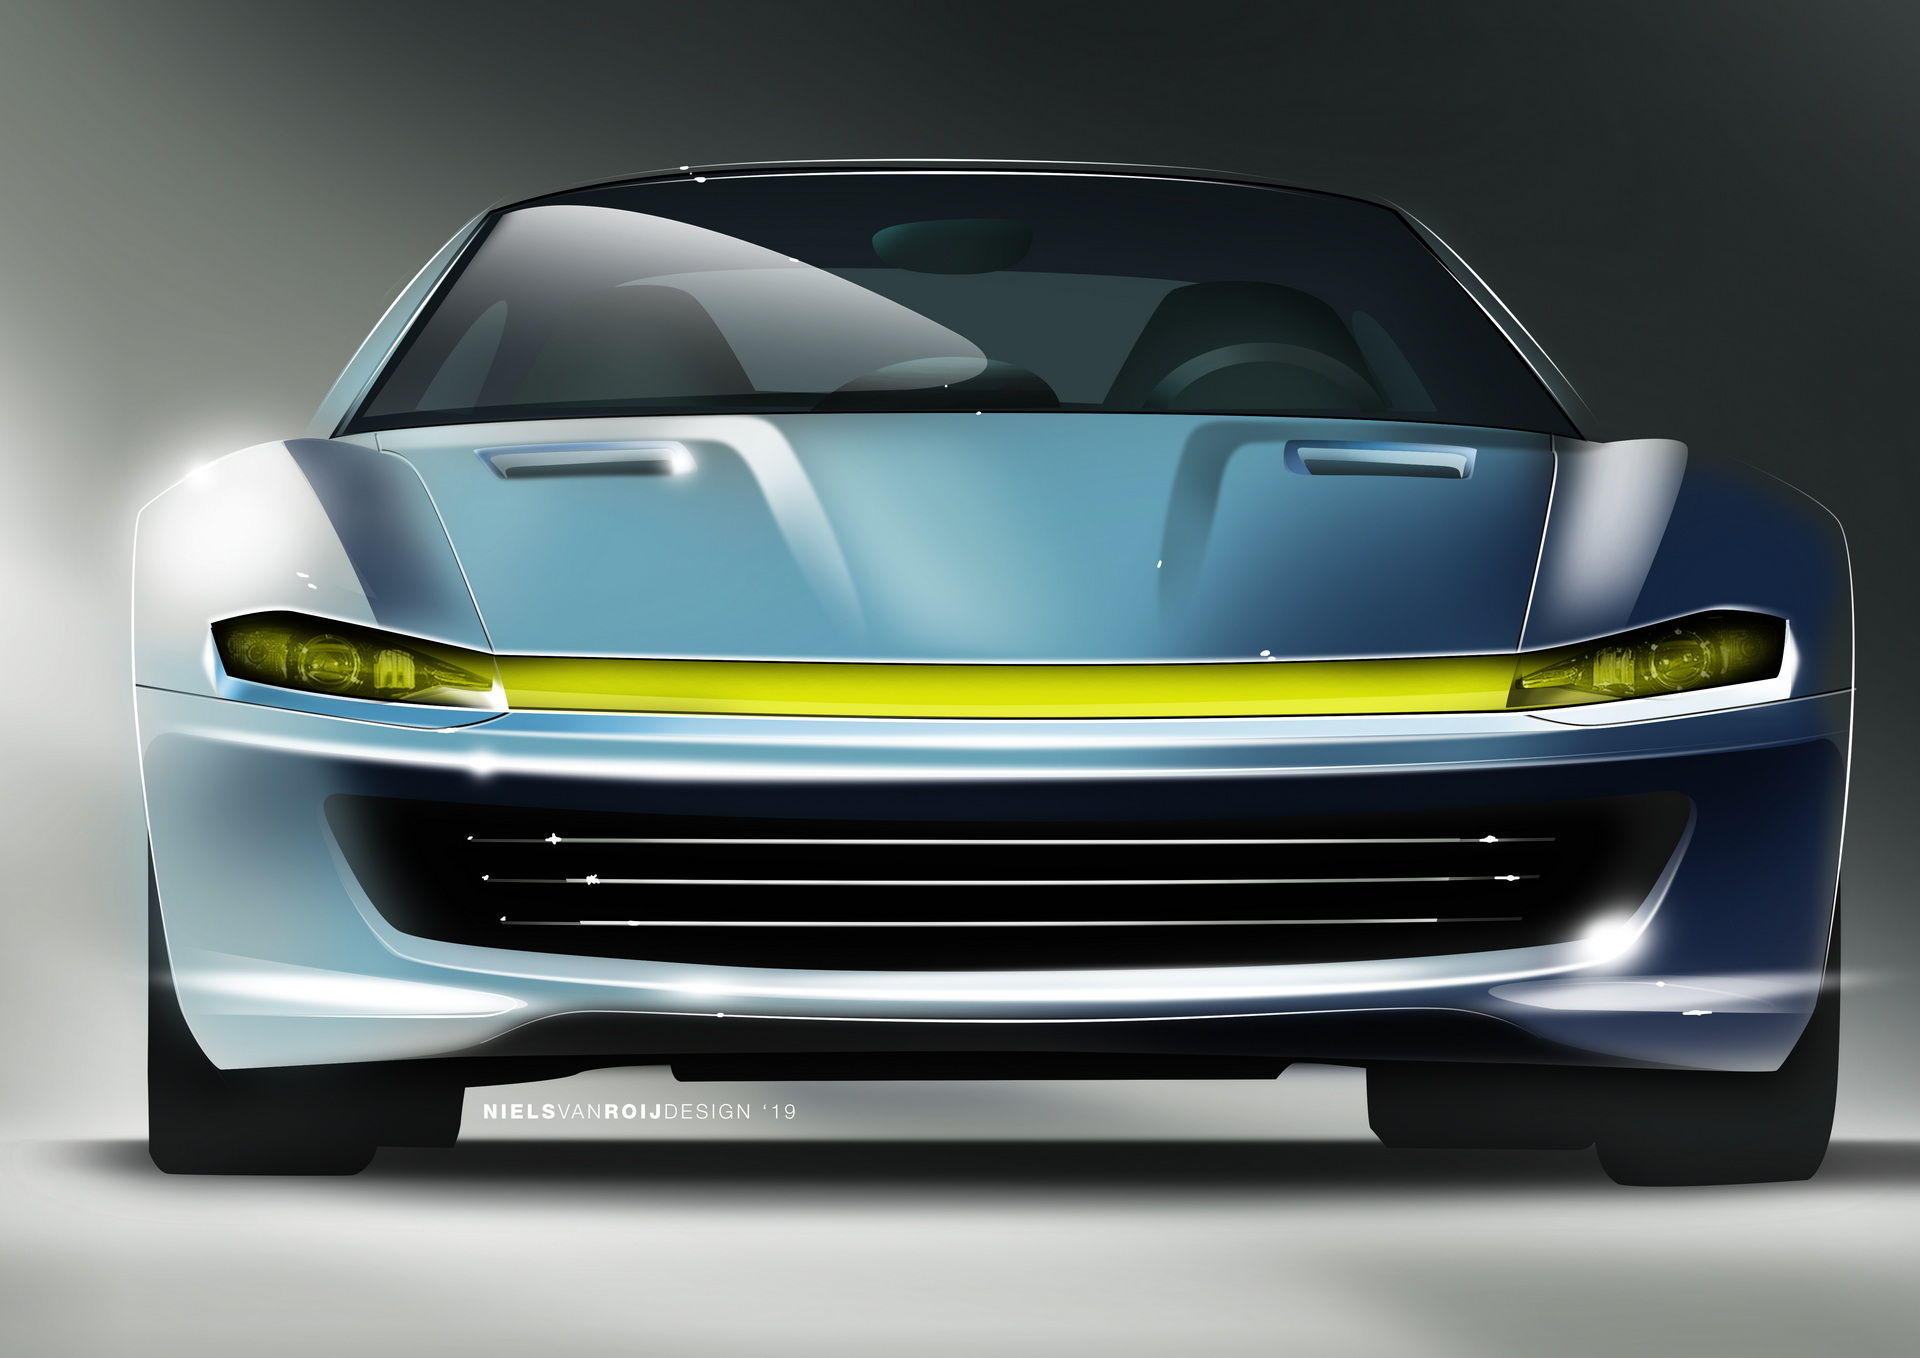 Ferrari-Daytona-Shooting-Brake-Hommage-by-Niels-van-Roij-Design-33